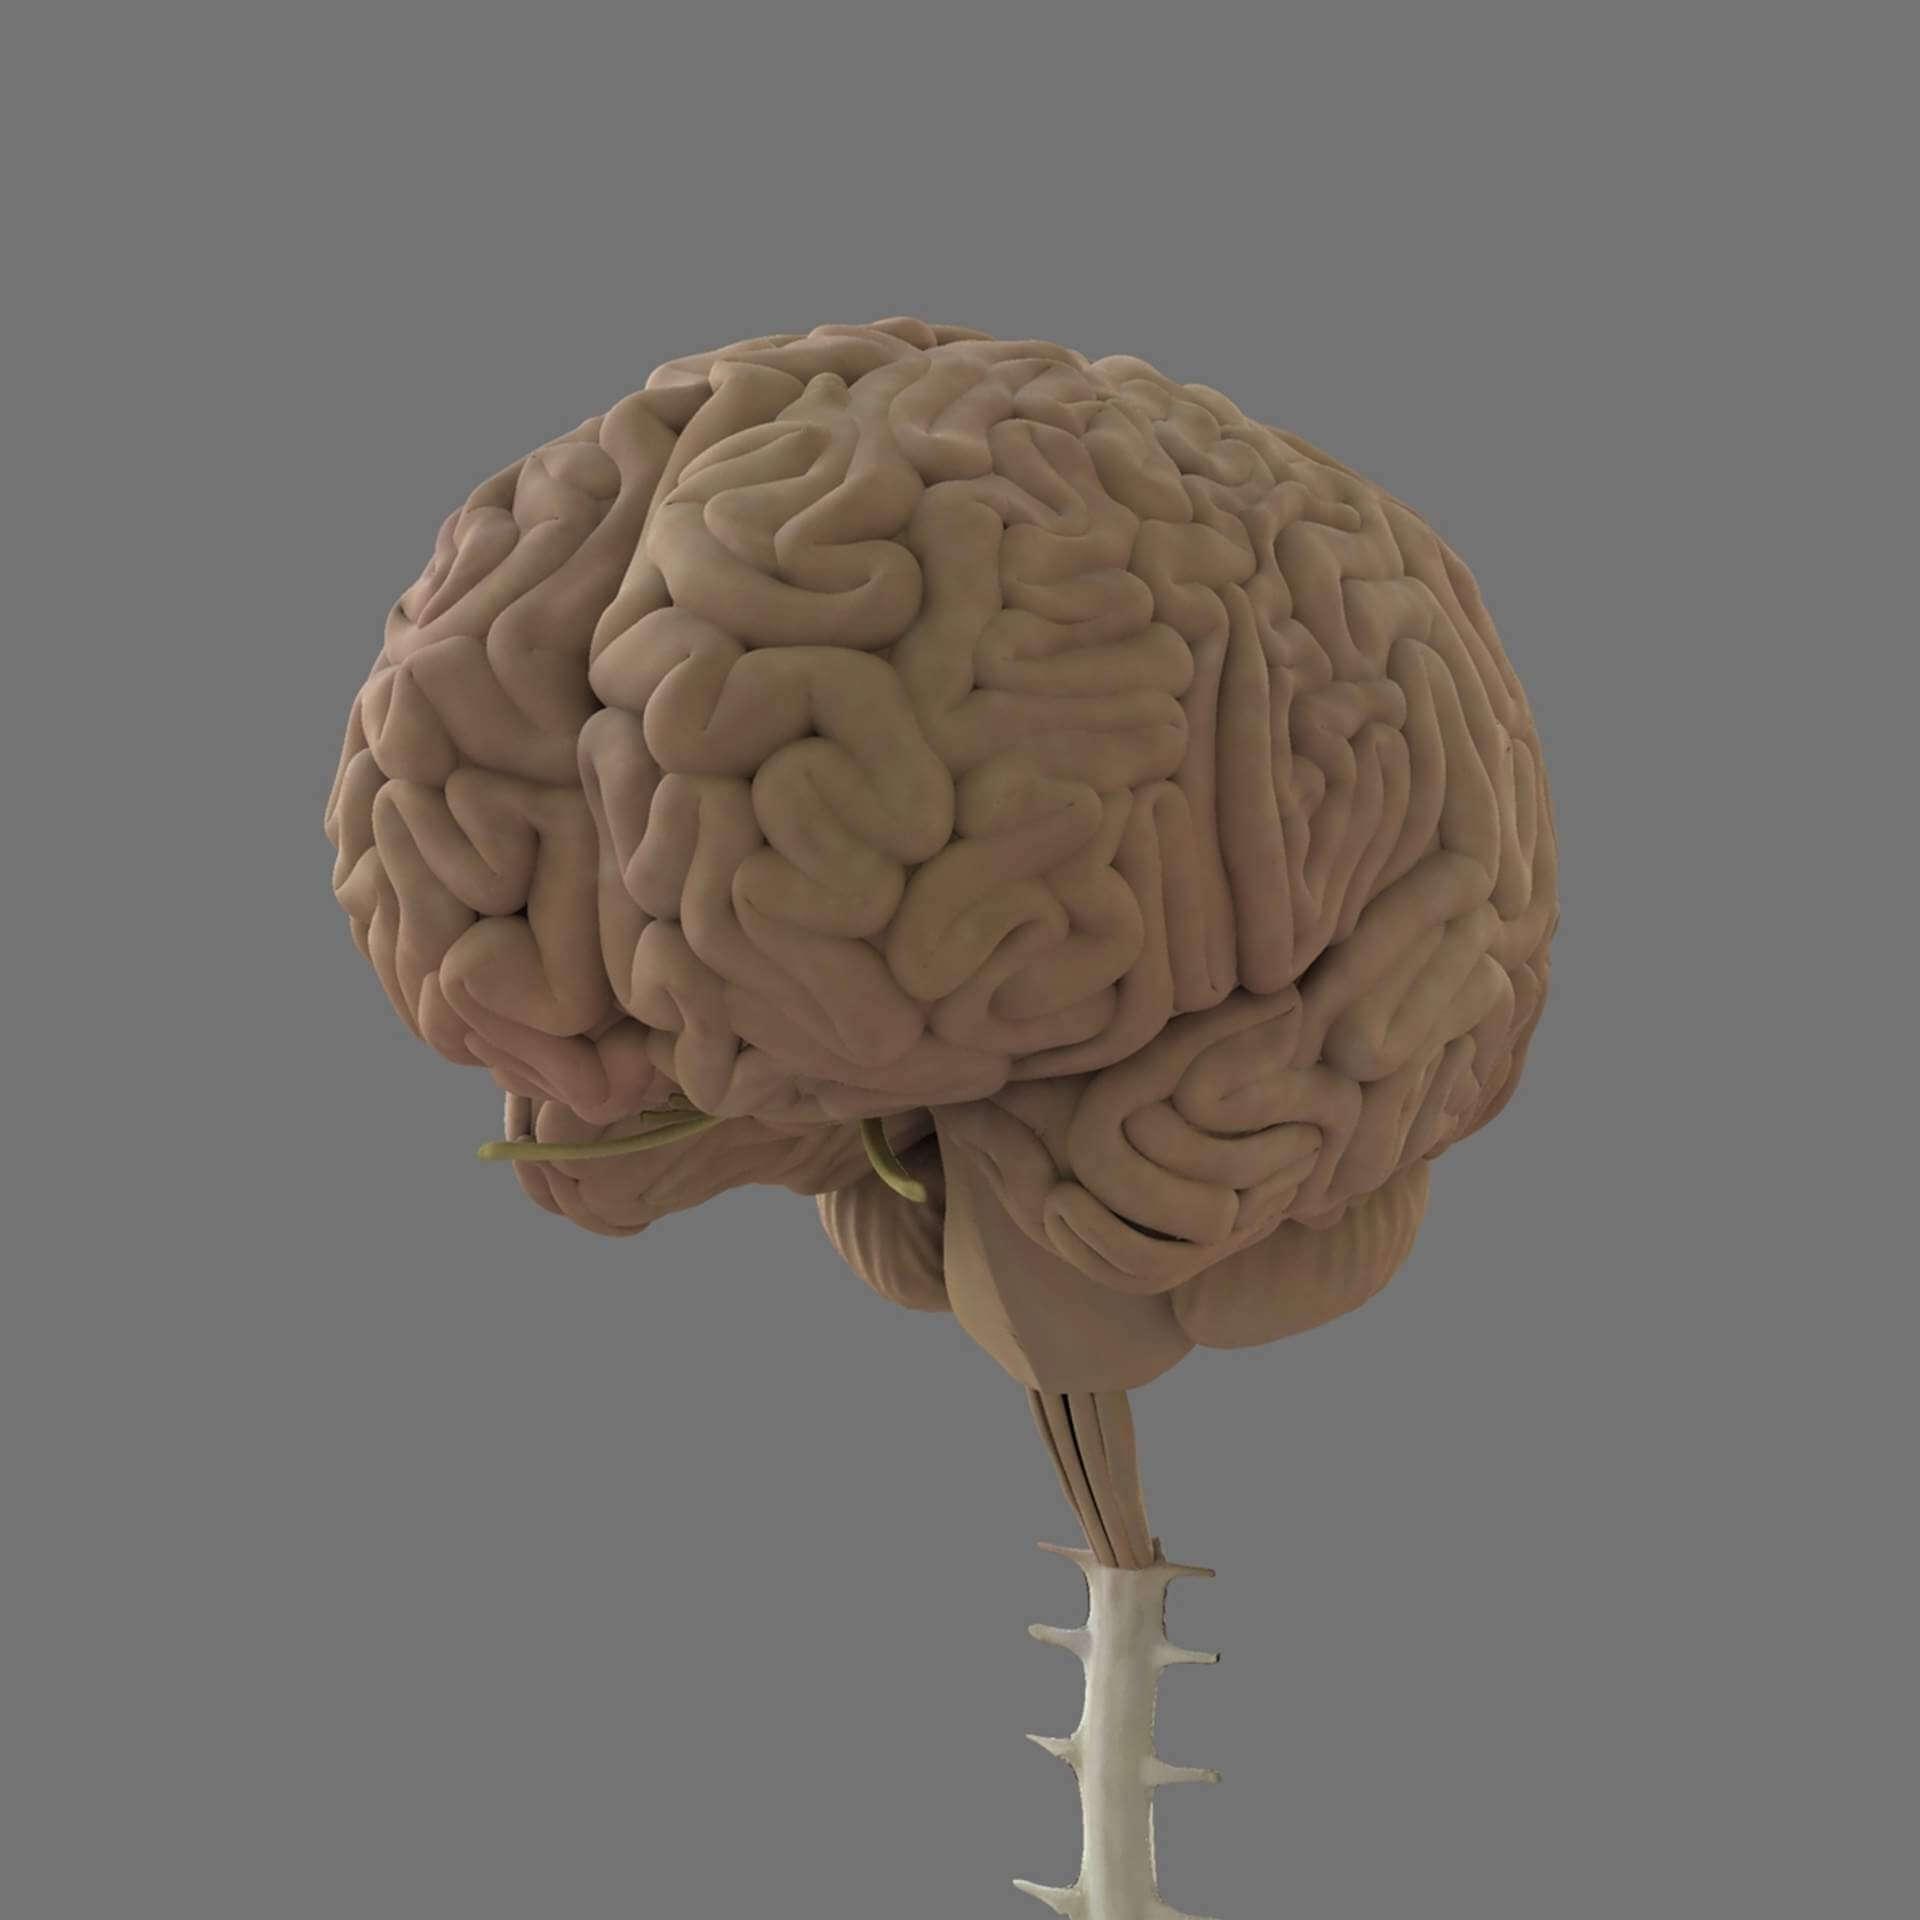 Human Skull with Brain 3D Model